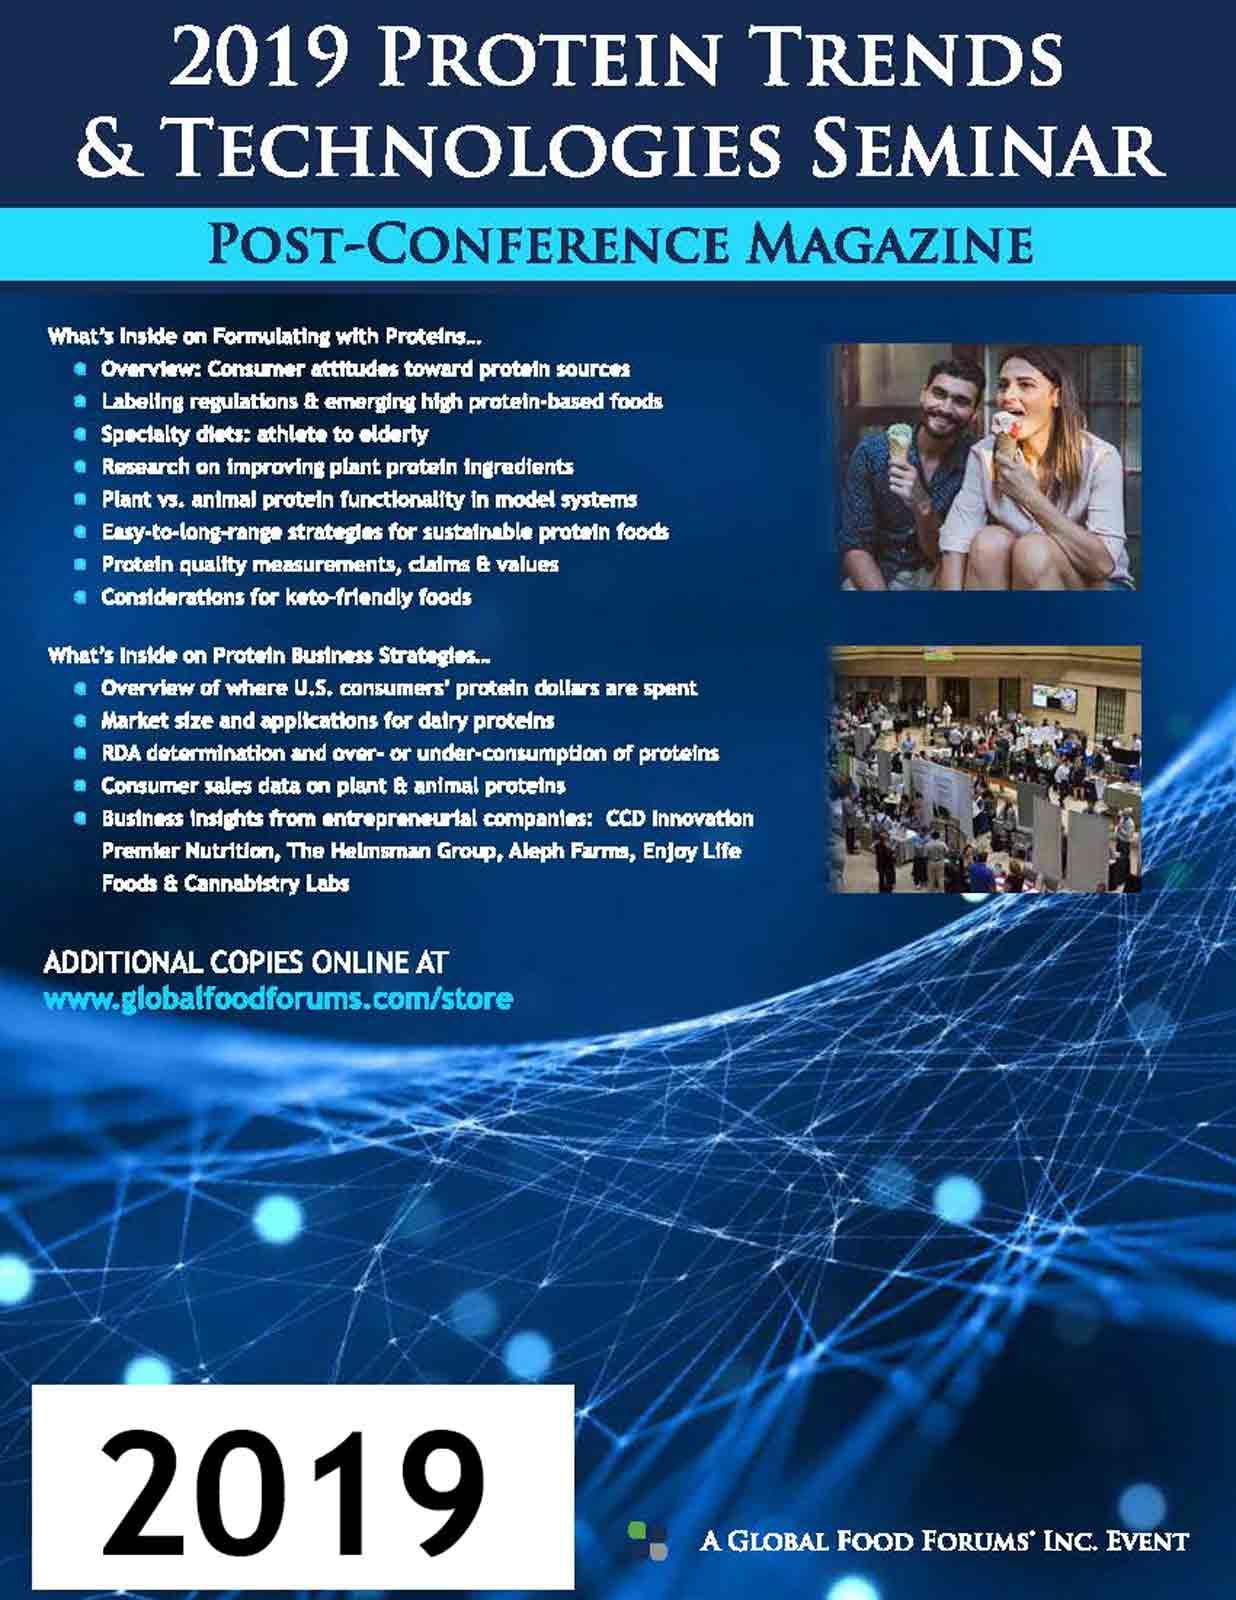 2019 PROTEIN TRENDS TECHNOLOGIES SEMINAR MAGAZINE COVER